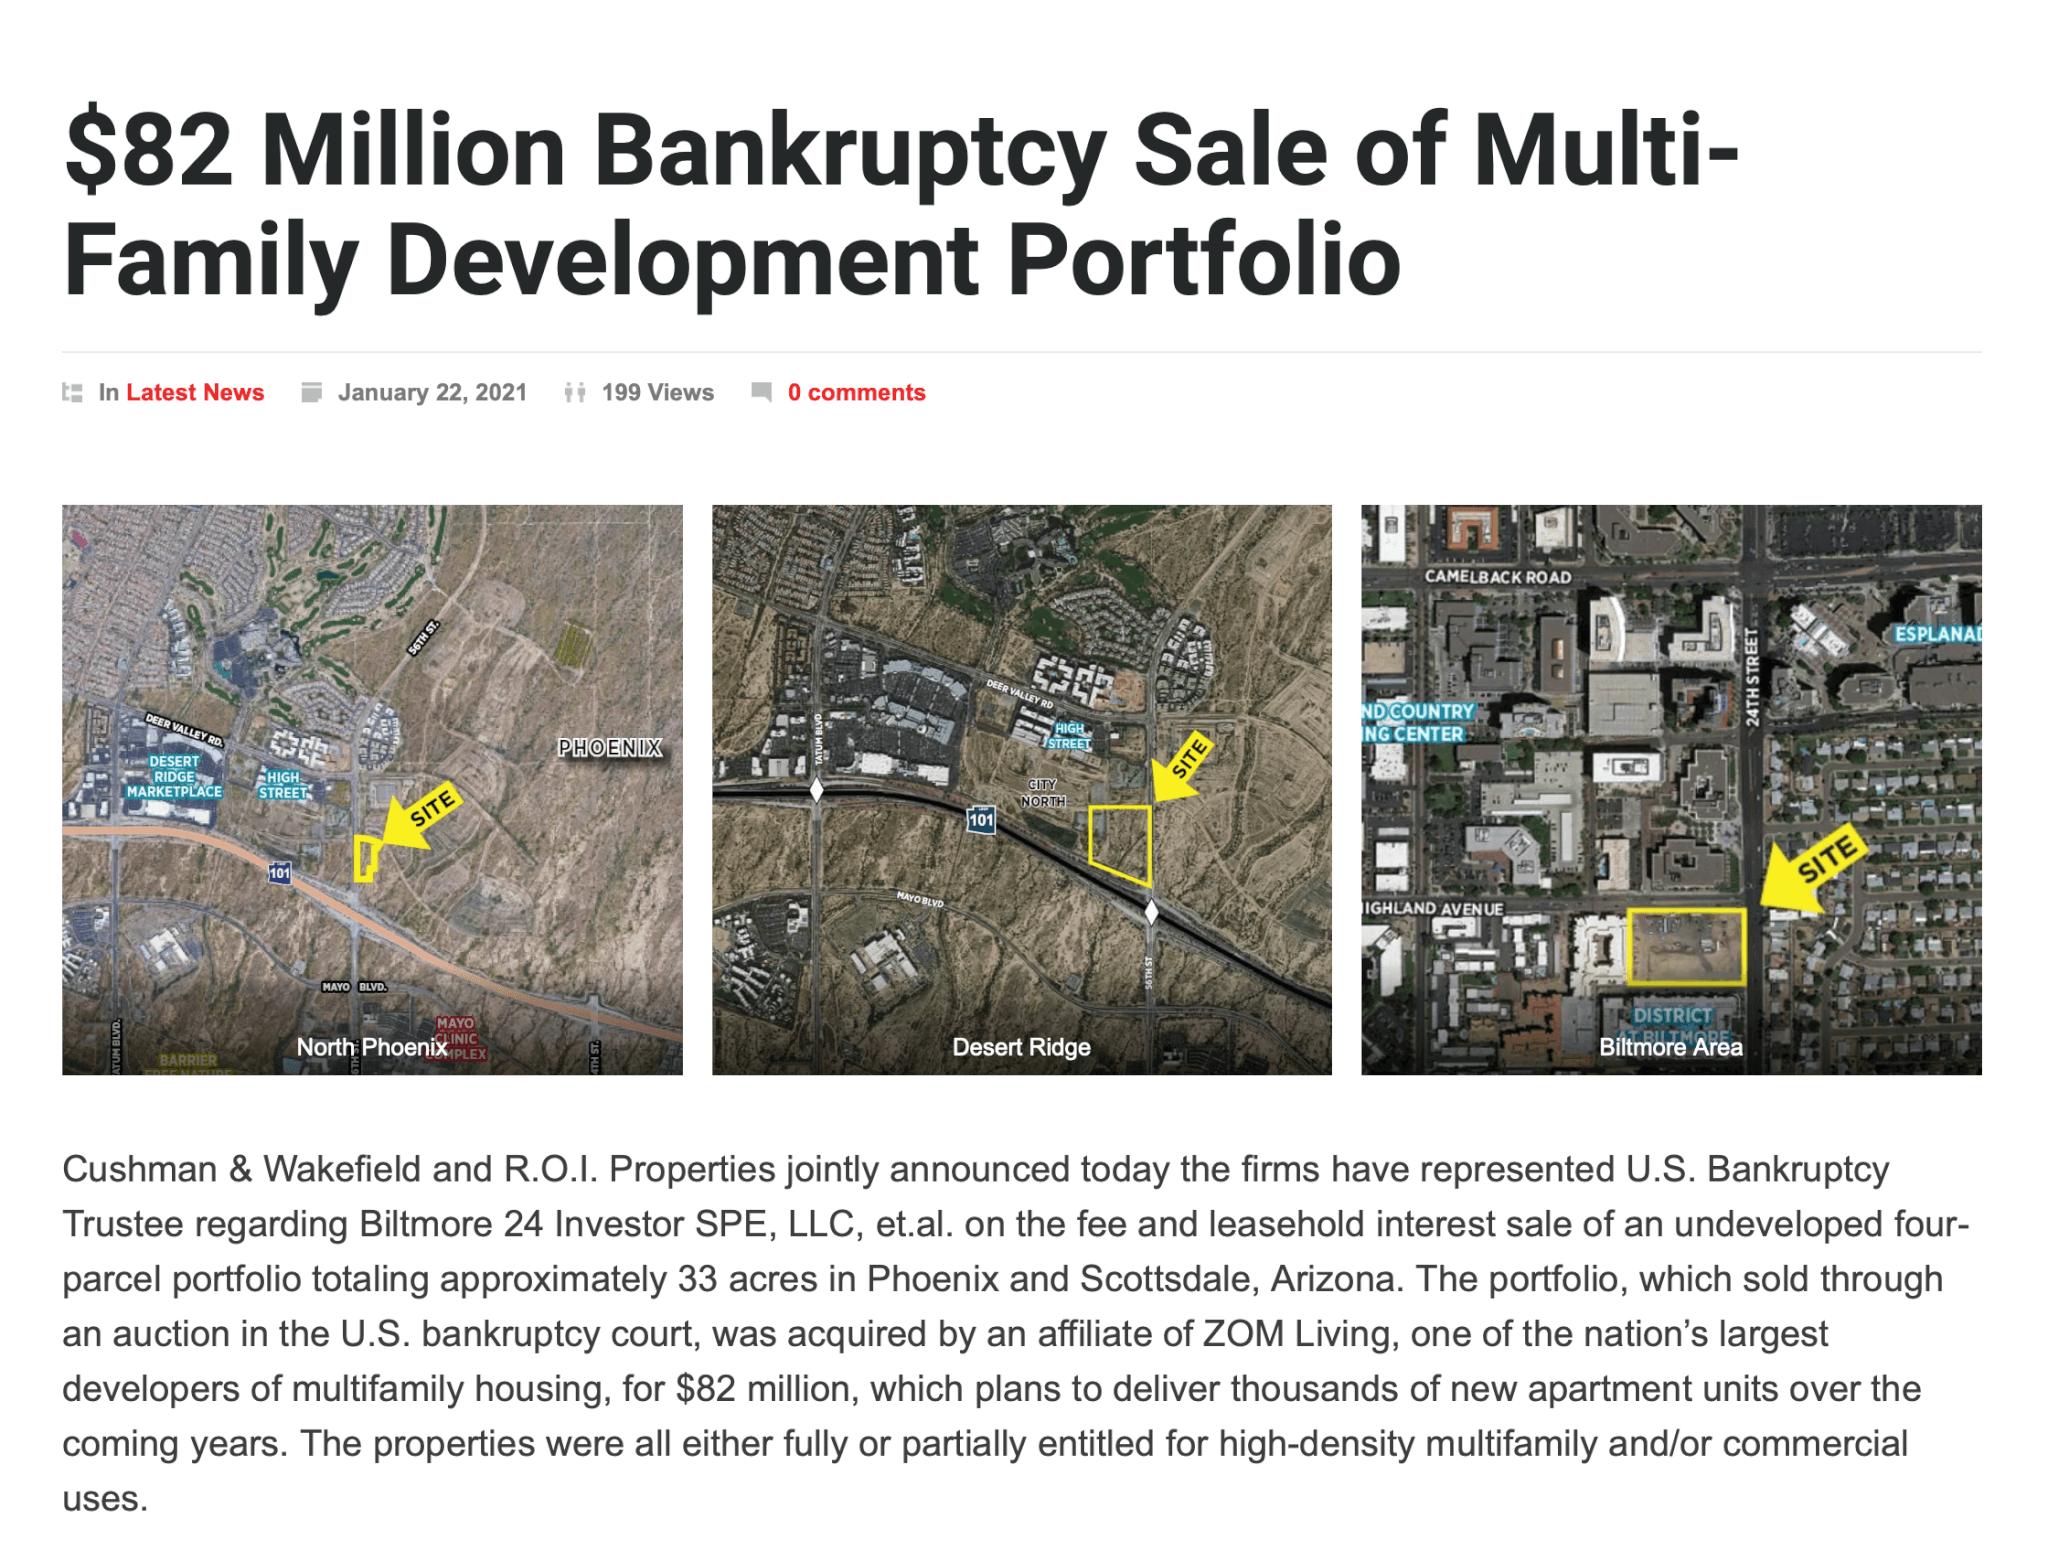 82 Million Bankruptcy Sale of Multi-Family Development Portfolio